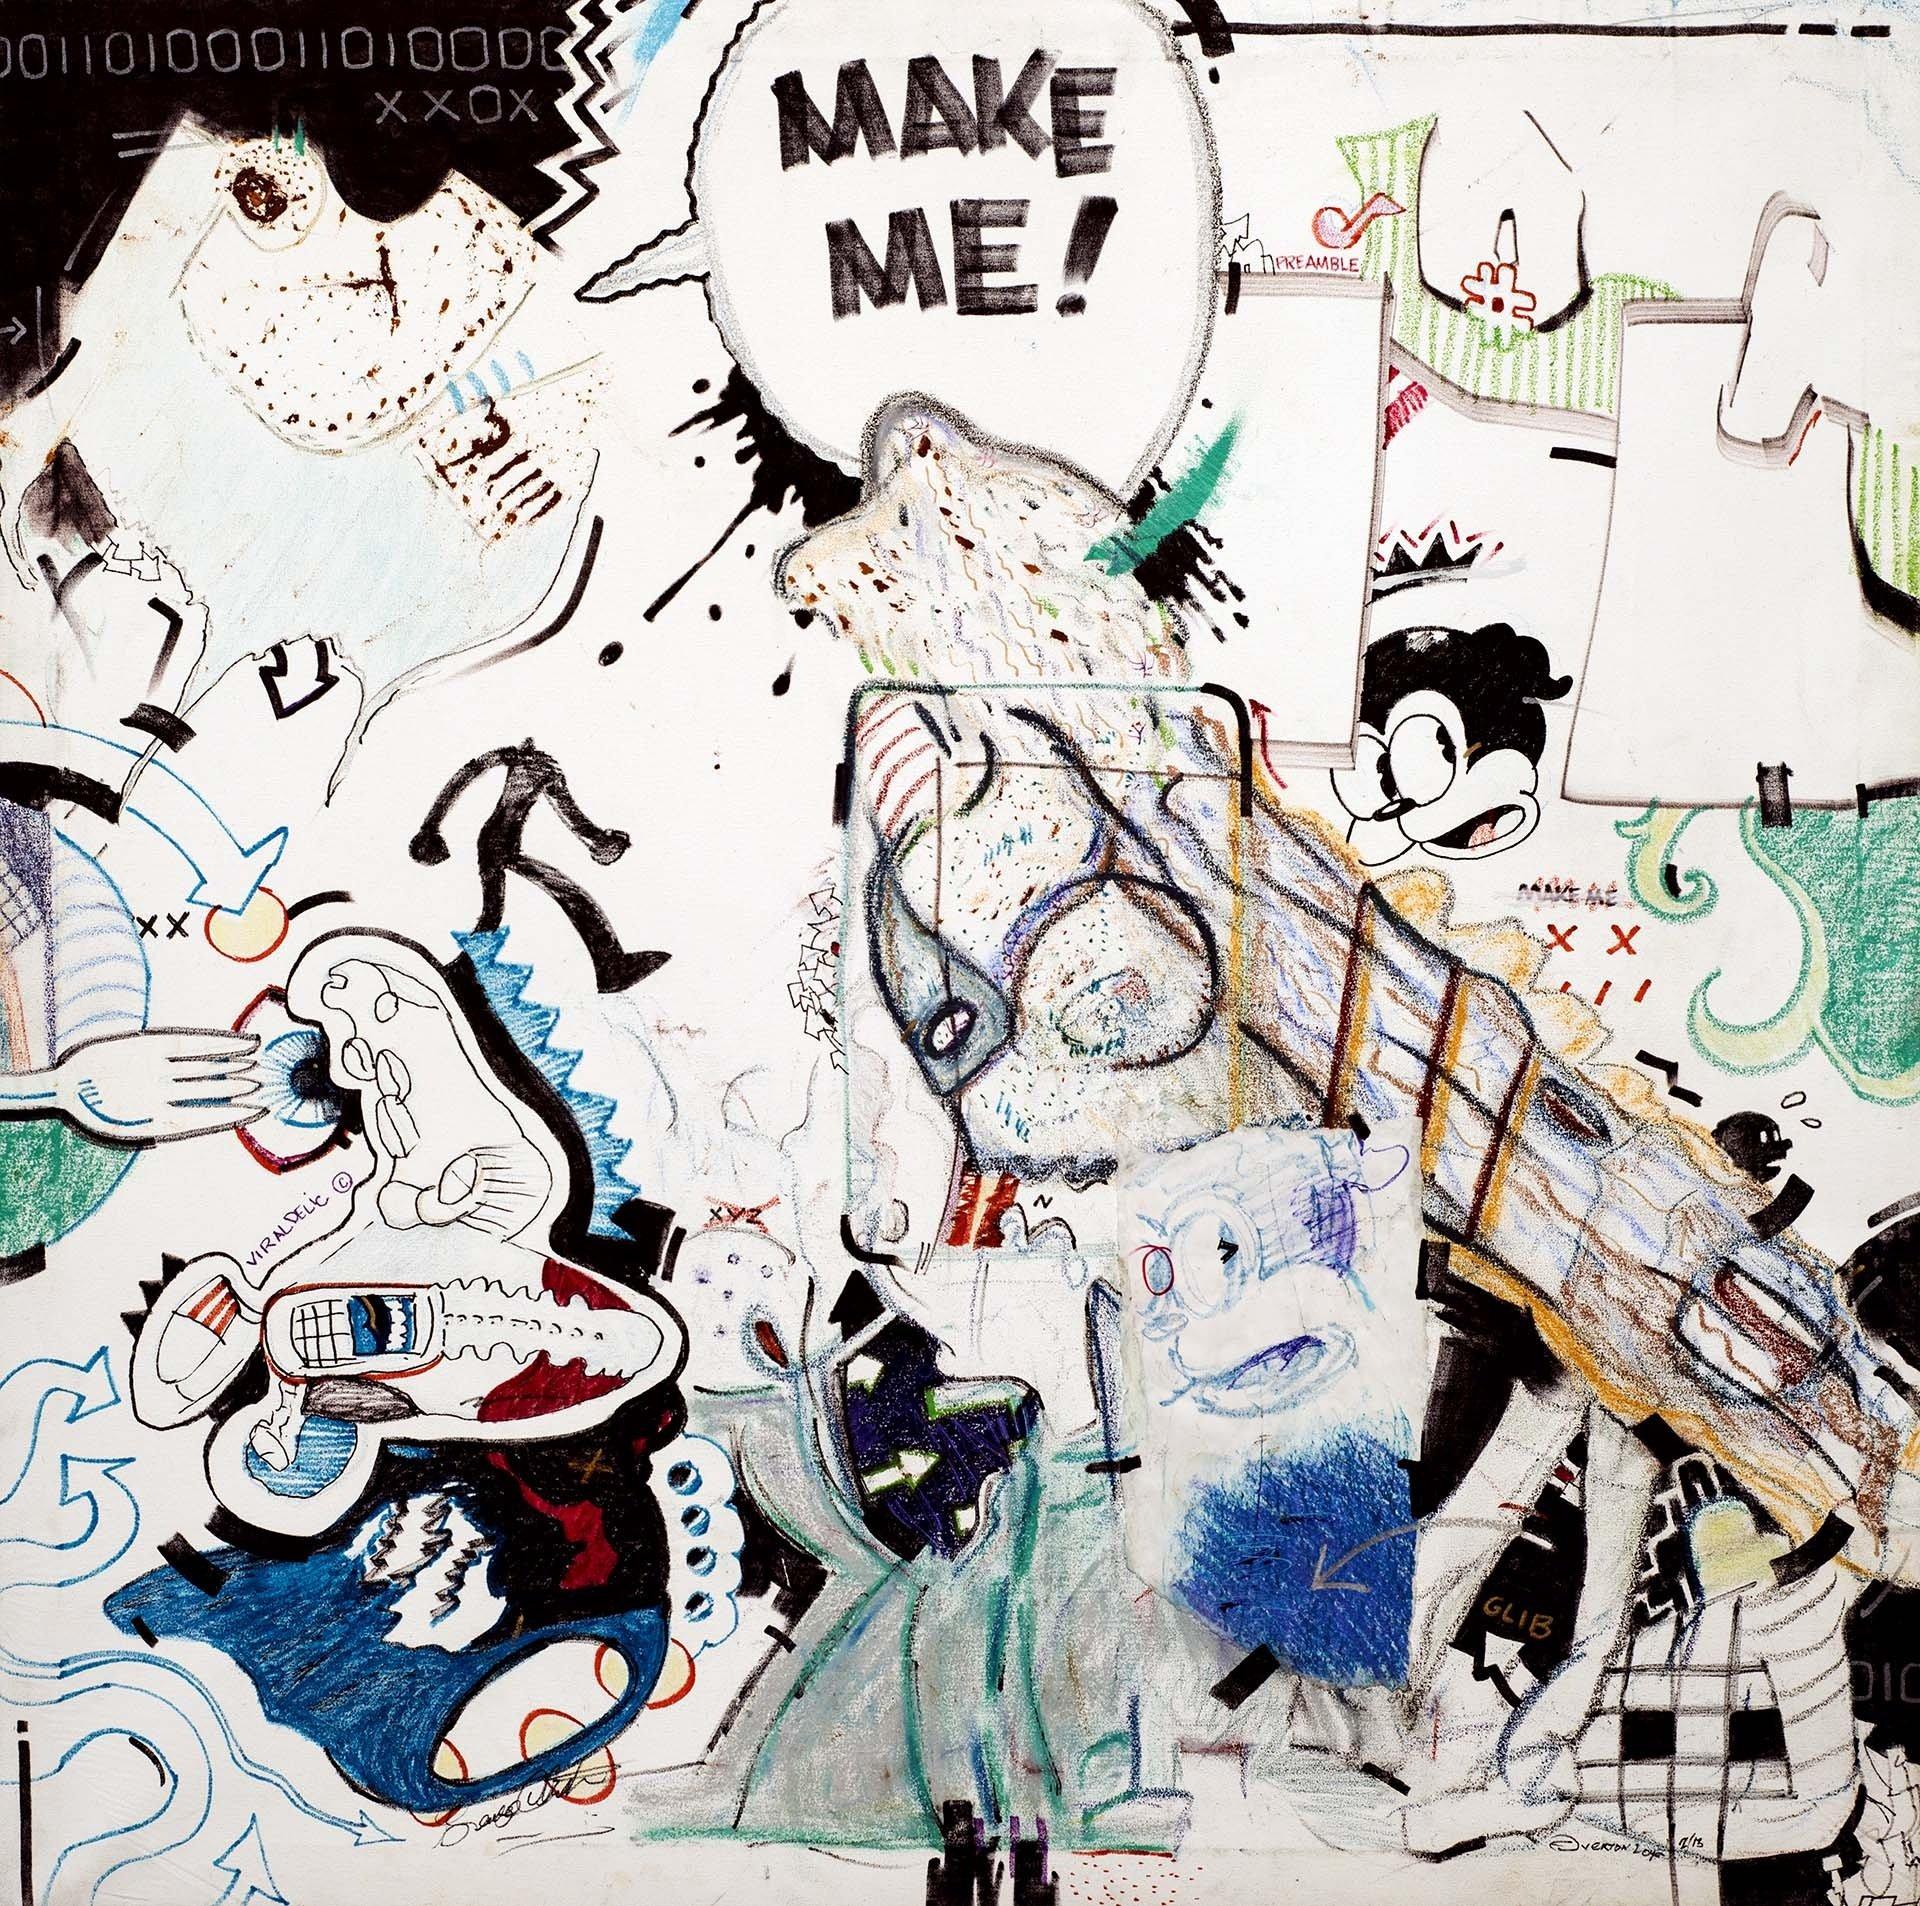 Make Me!